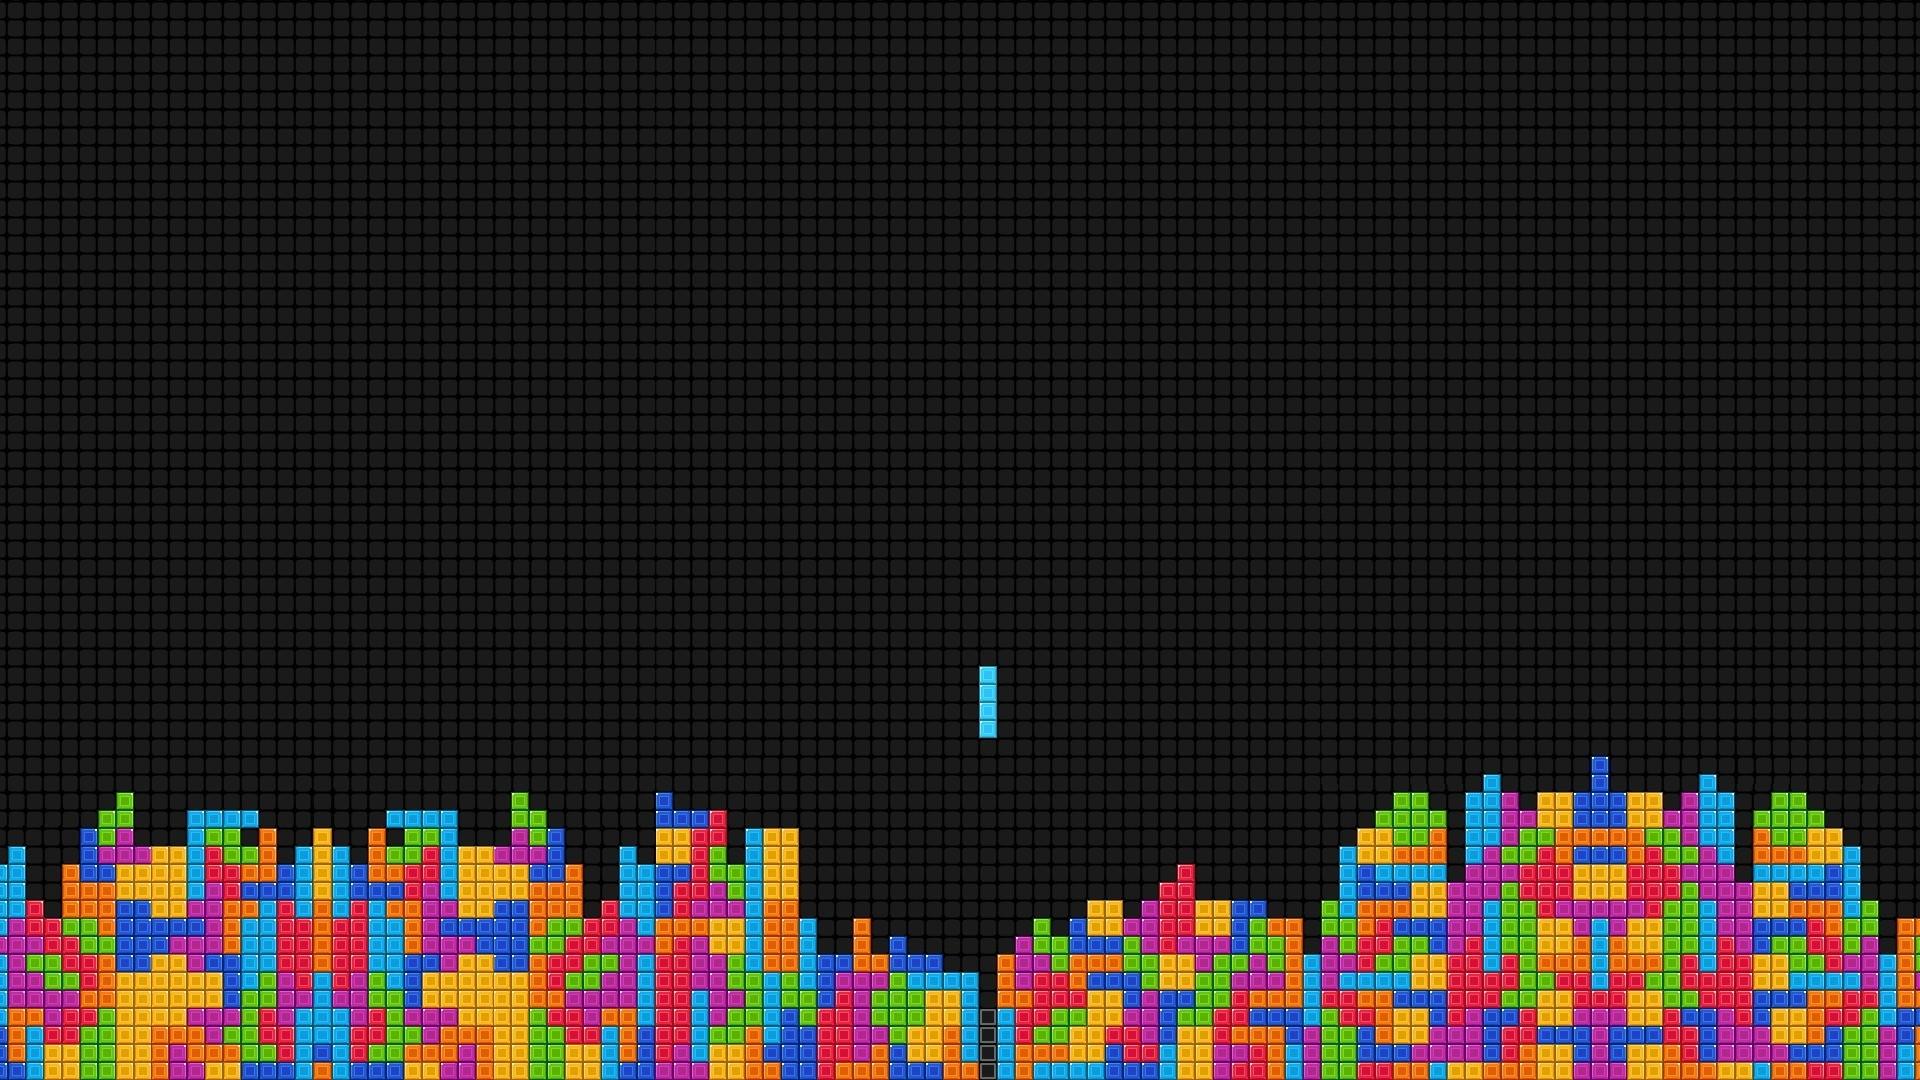 tetris background 239007   500 Startups 1920x1080